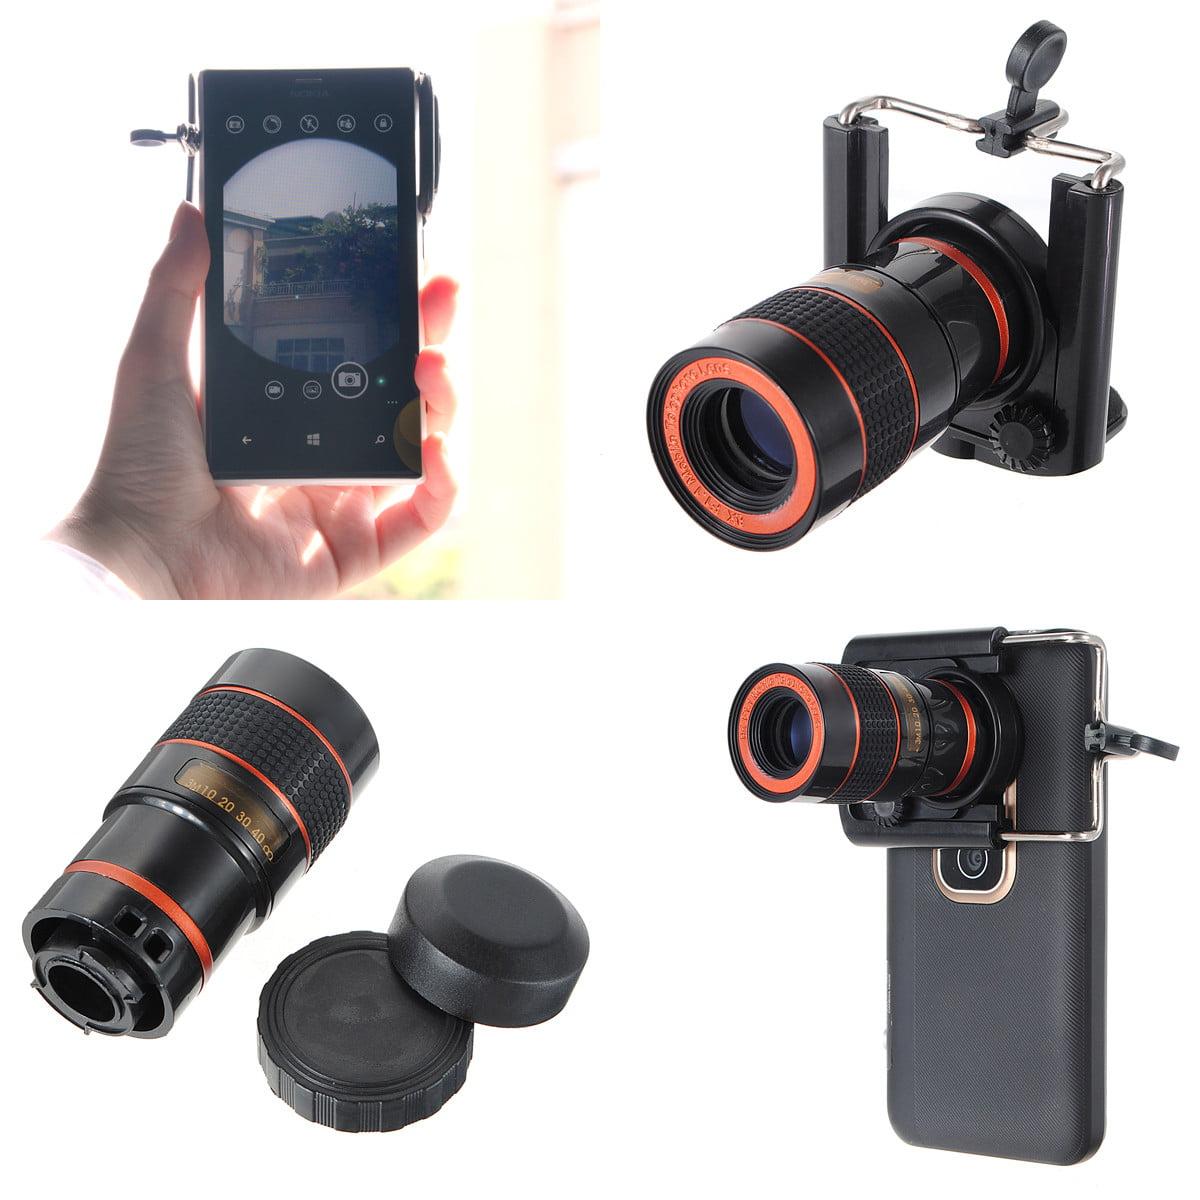 HD Ajustable long focal lens telescope Waterproof 8X Focus Zoom Mini Monocular Cell Phone Telescope Camera